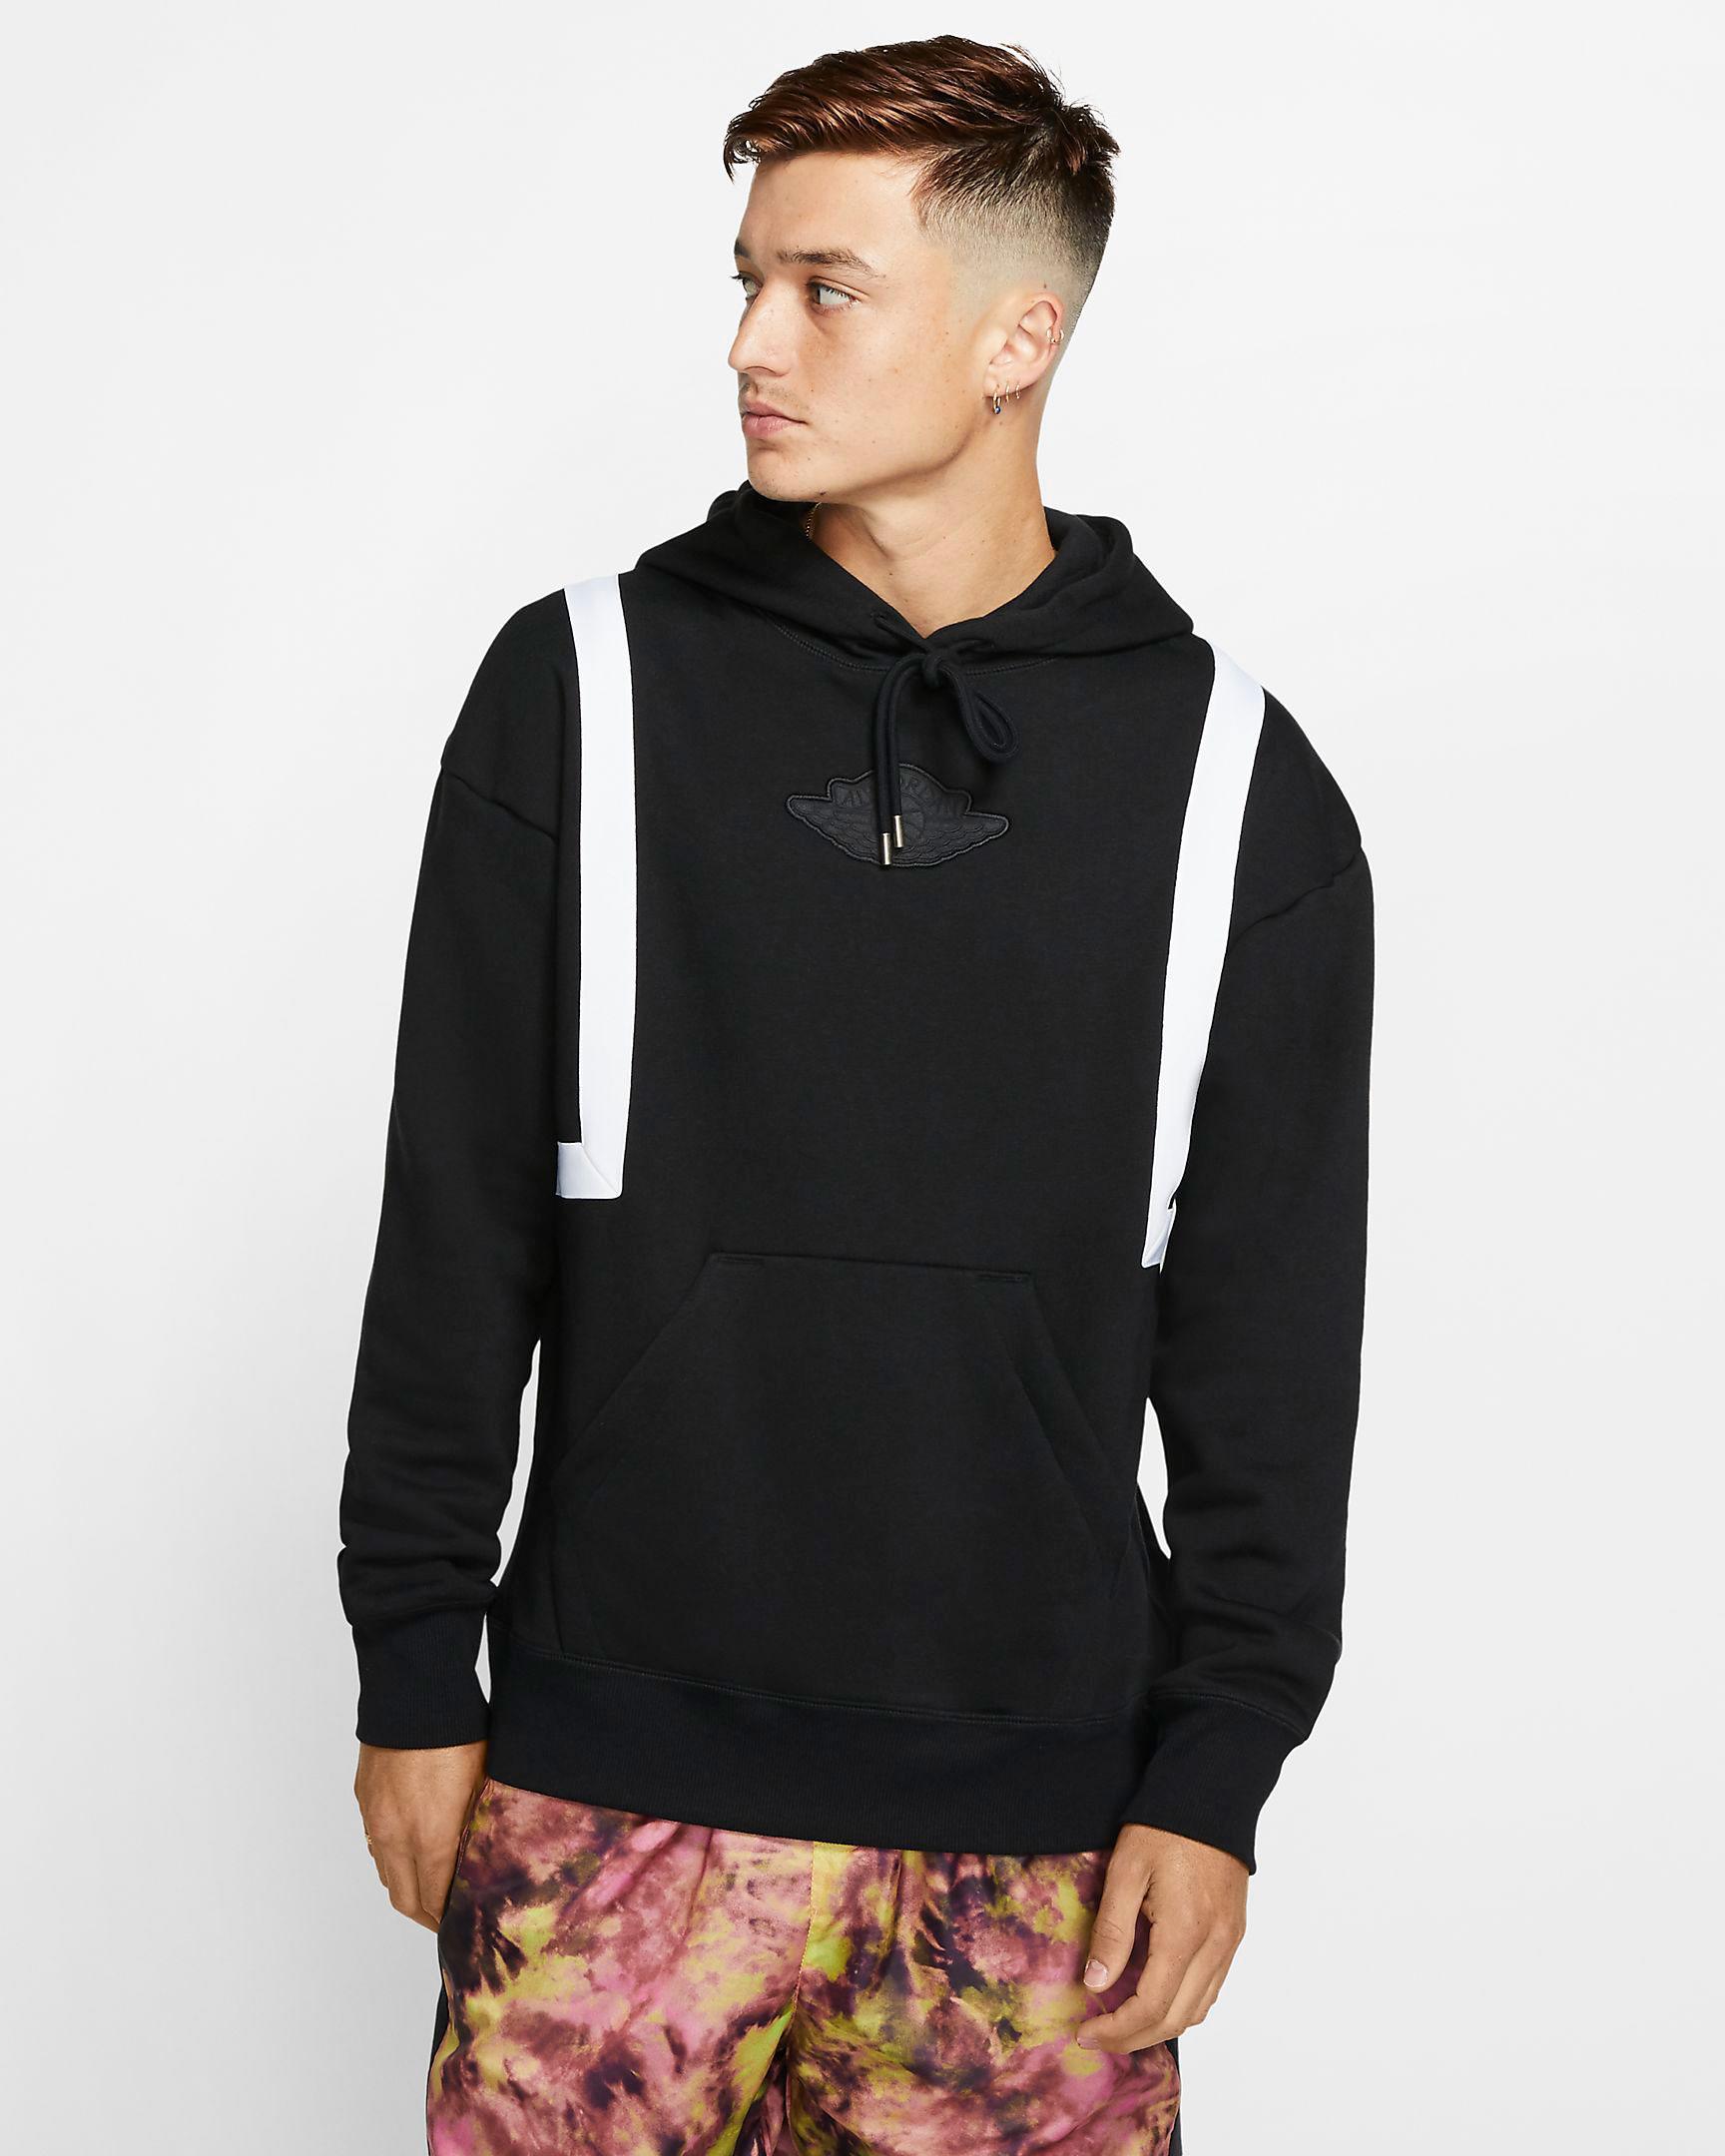 jordan-rivals-hoodie-black-white